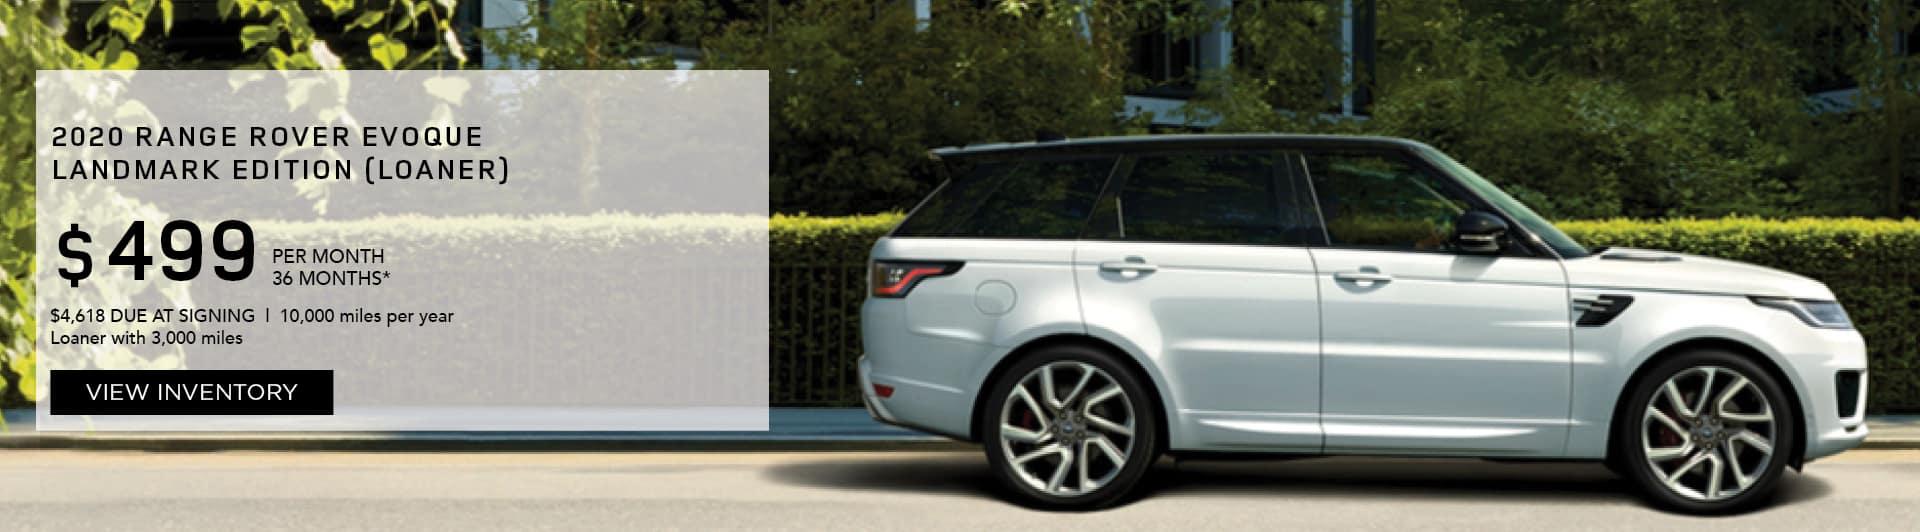 Louisville Land Rover >> Land Rover Louisville Land Rover Dealer In Louisville Ky